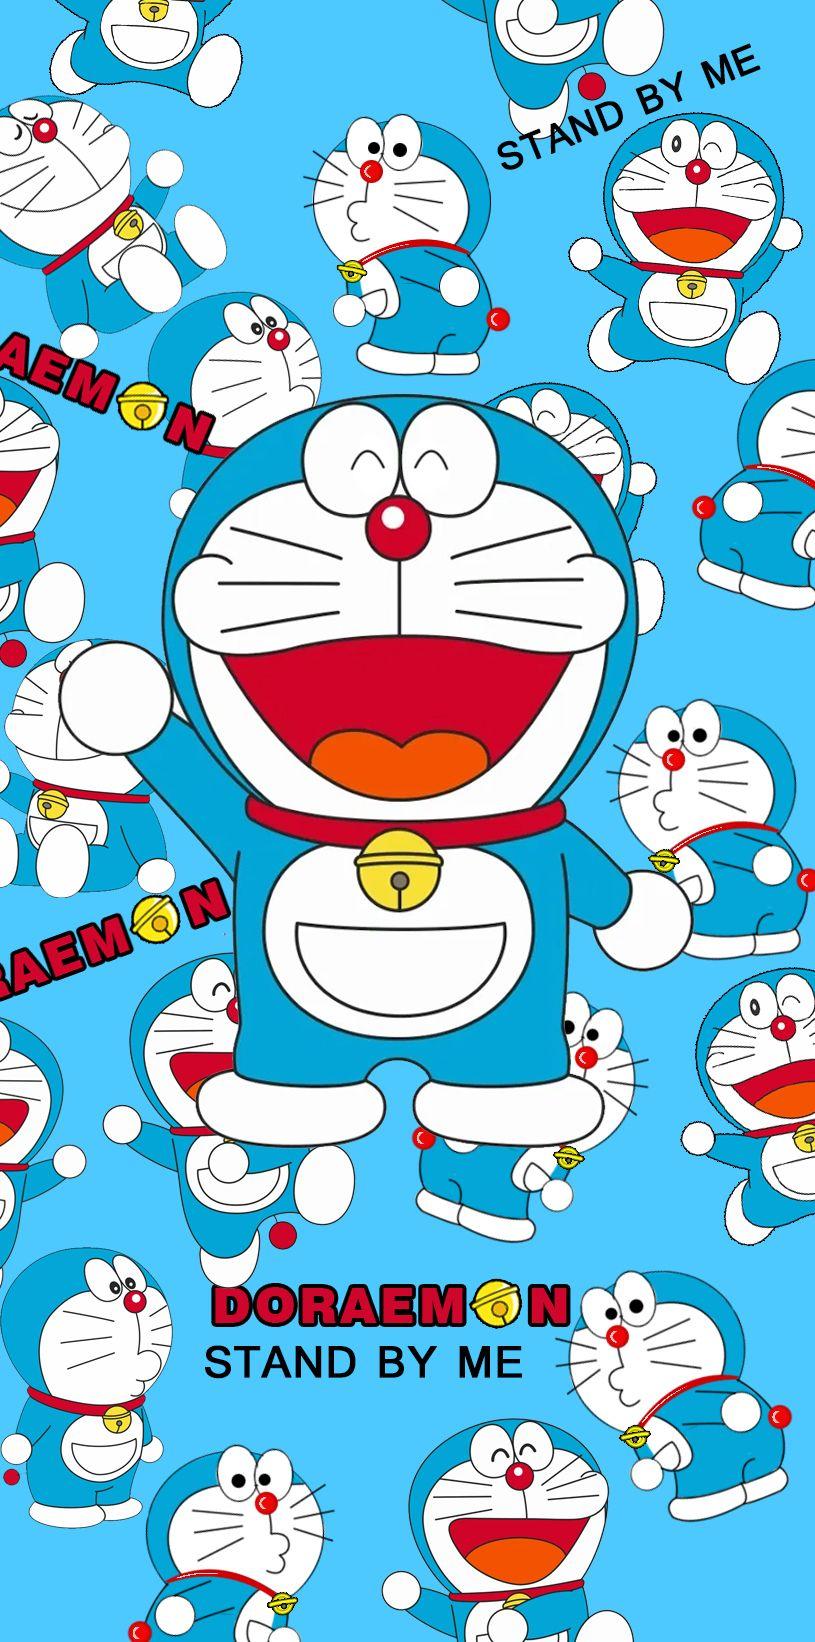 Wallpaper Gambar Doraemon